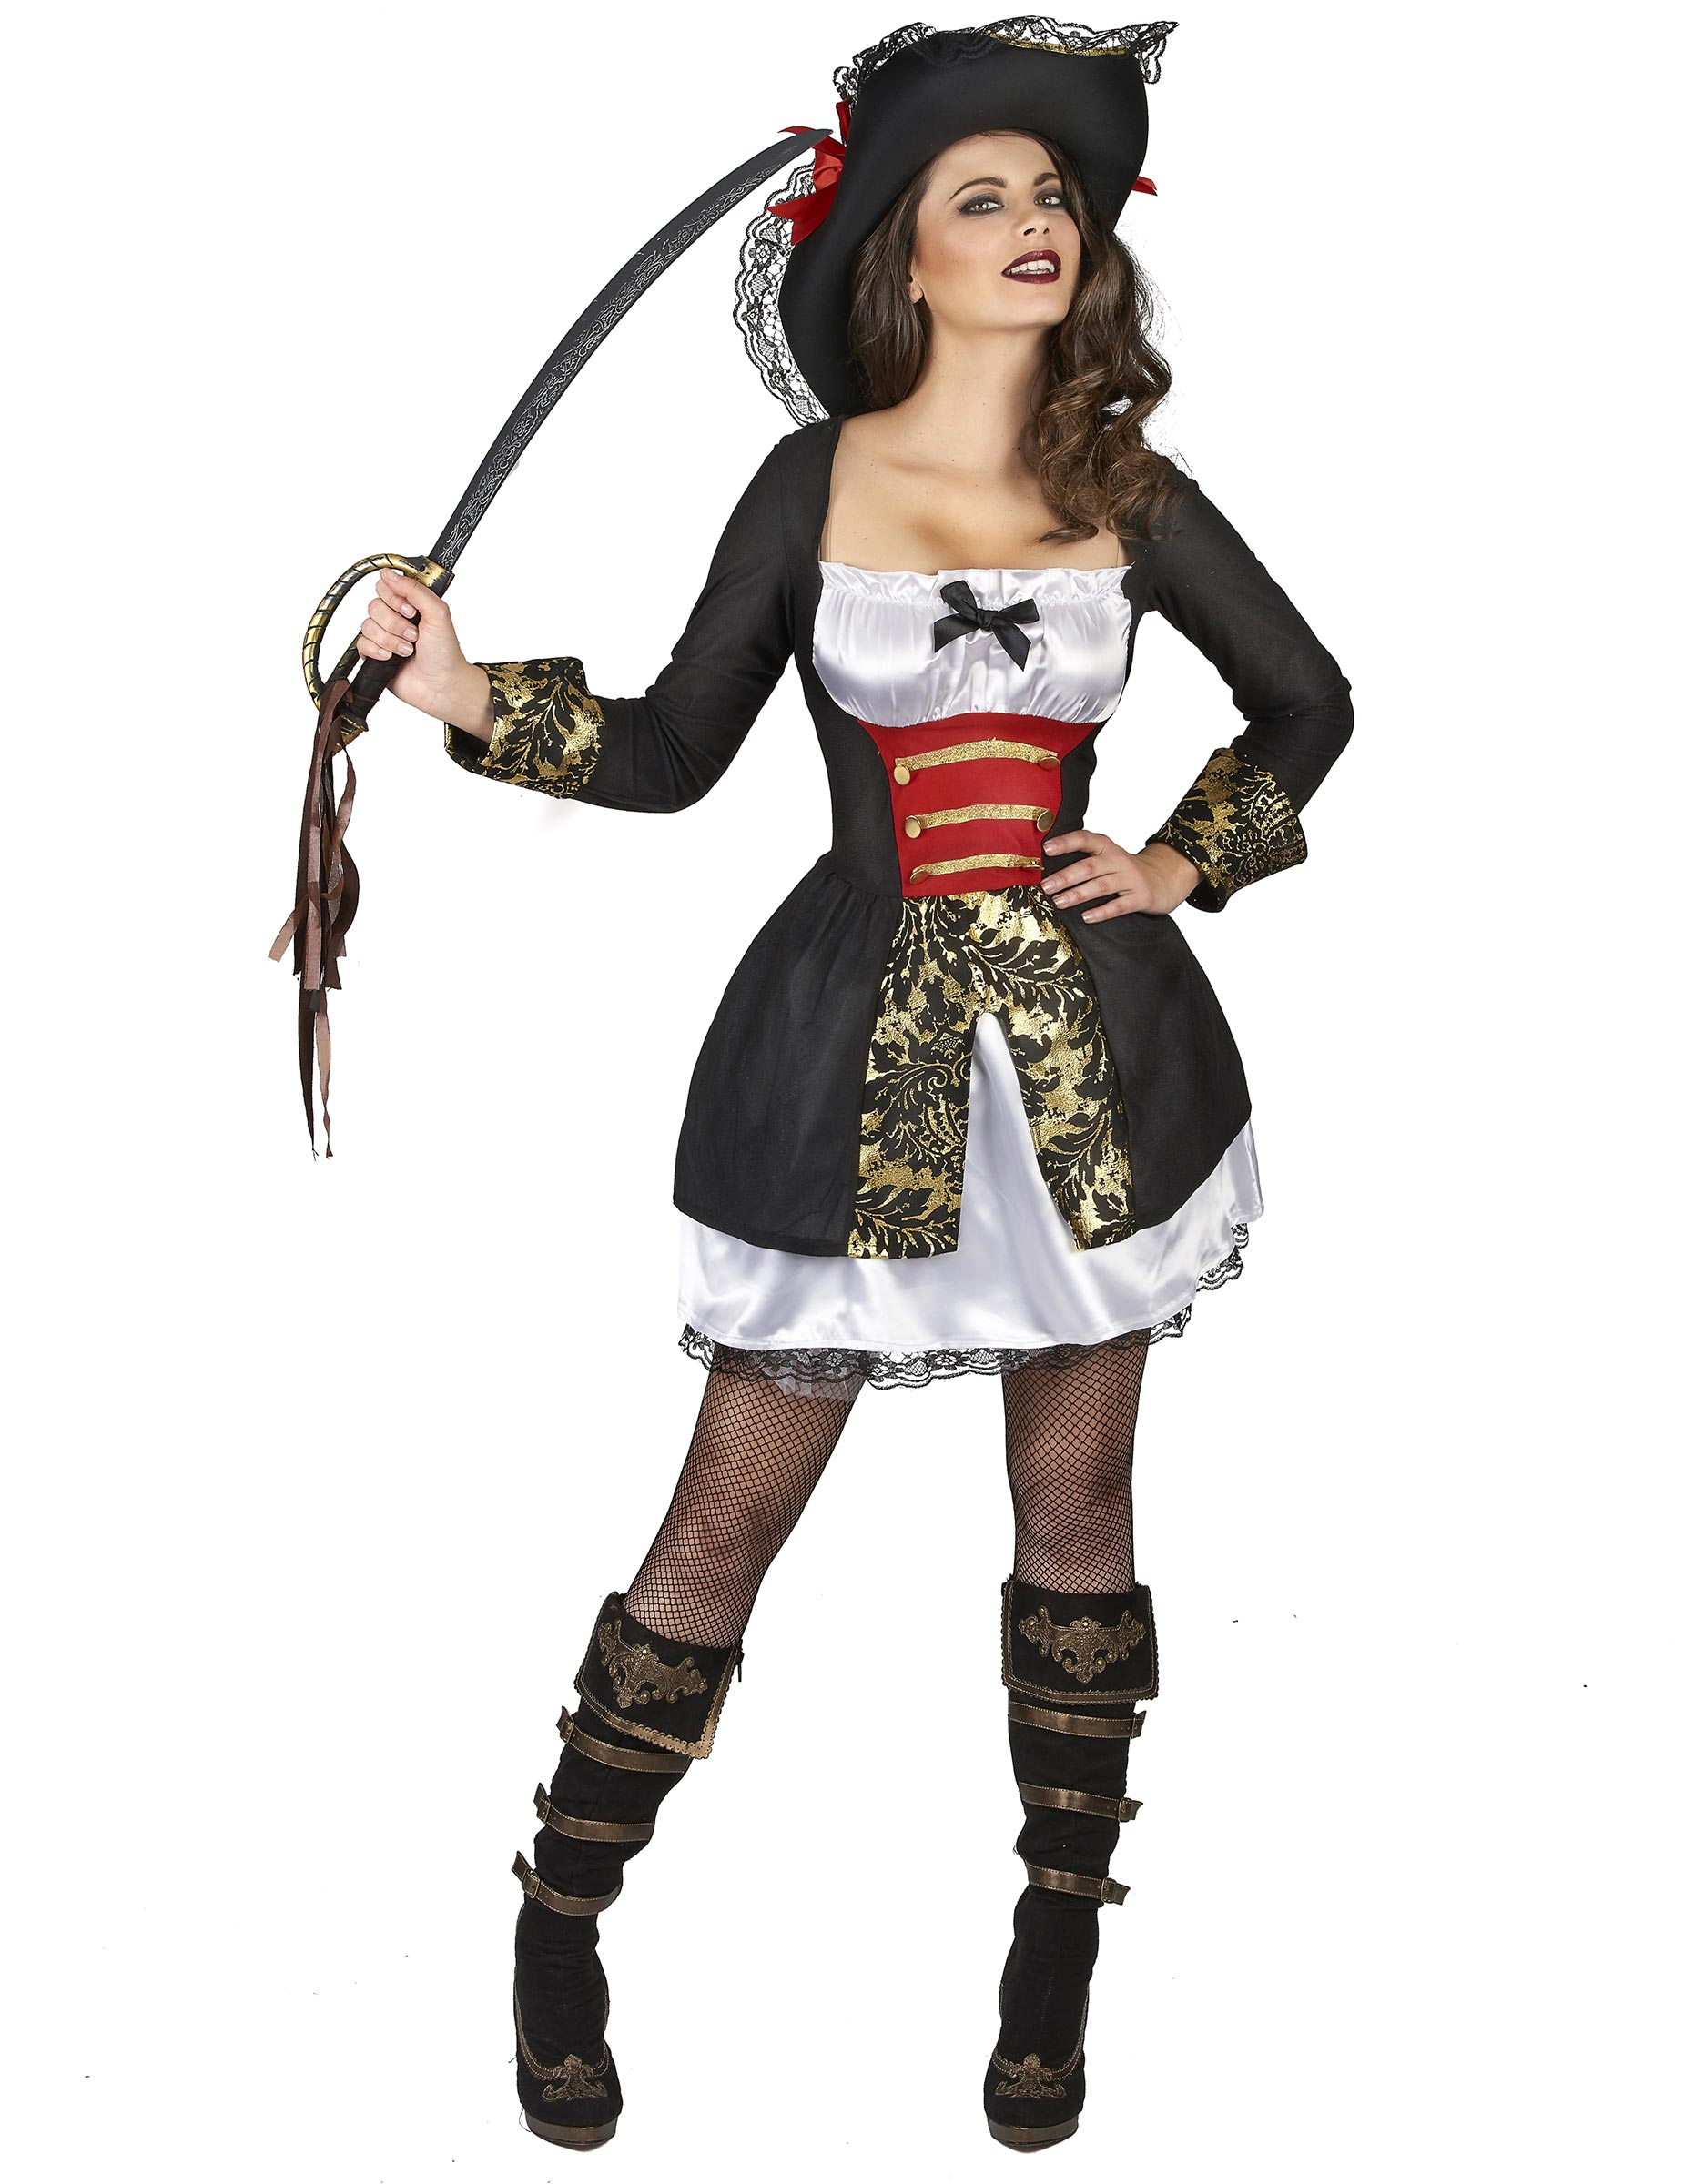 elegante korsaren damen verkleidung schwarz wei g nstige faschings kost me bei karneval megastore. Black Bedroom Furniture Sets. Home Design Ideas